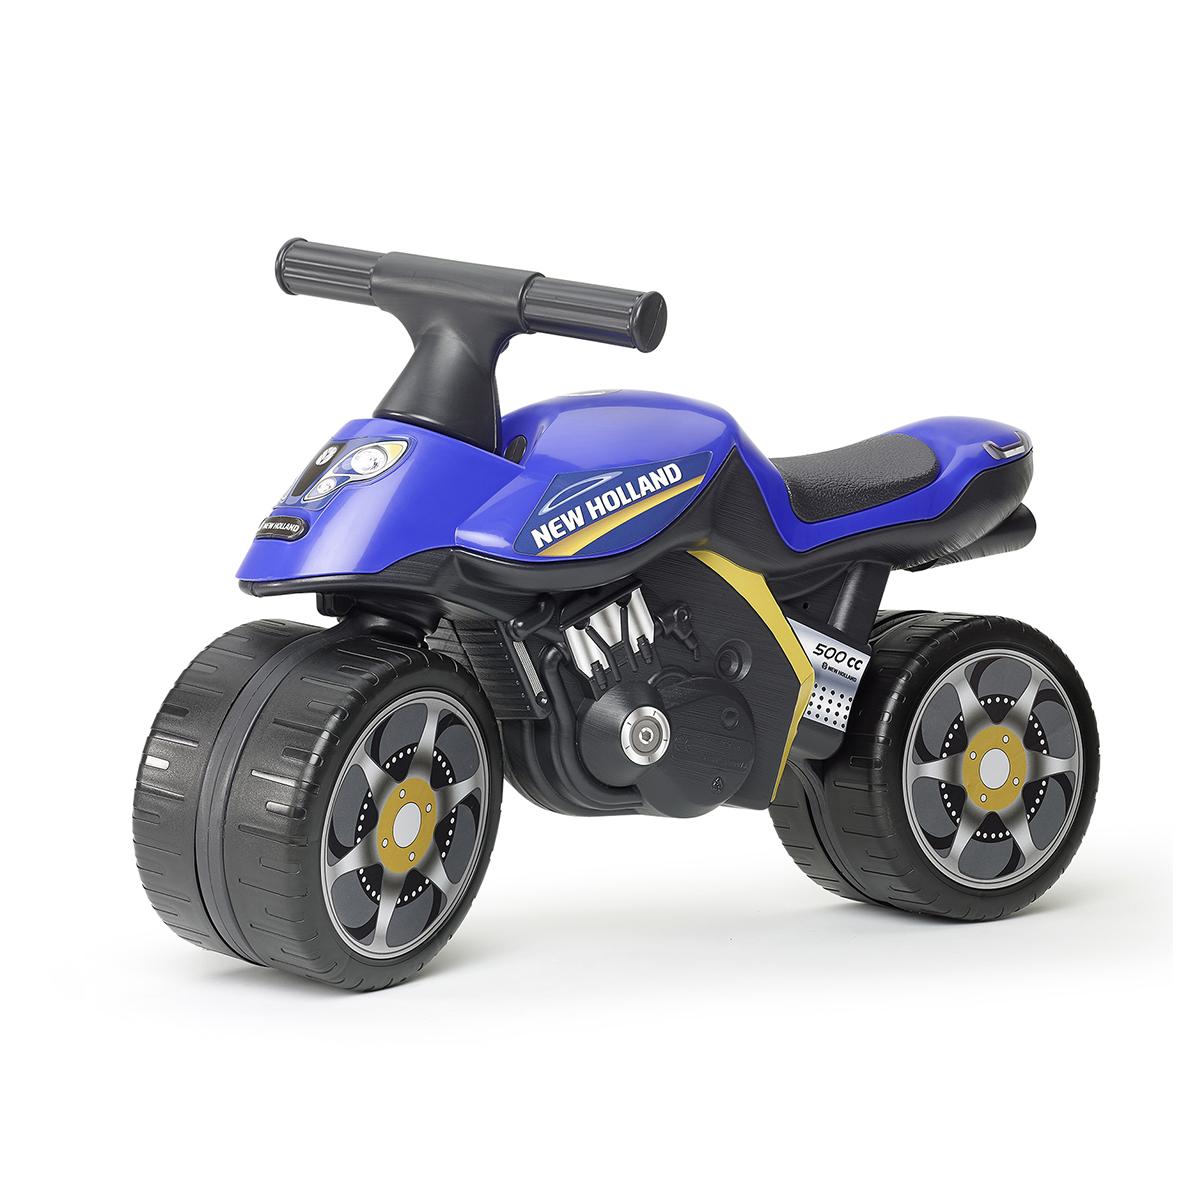 Porteur Falk Baby Moto New Holland - Bleu